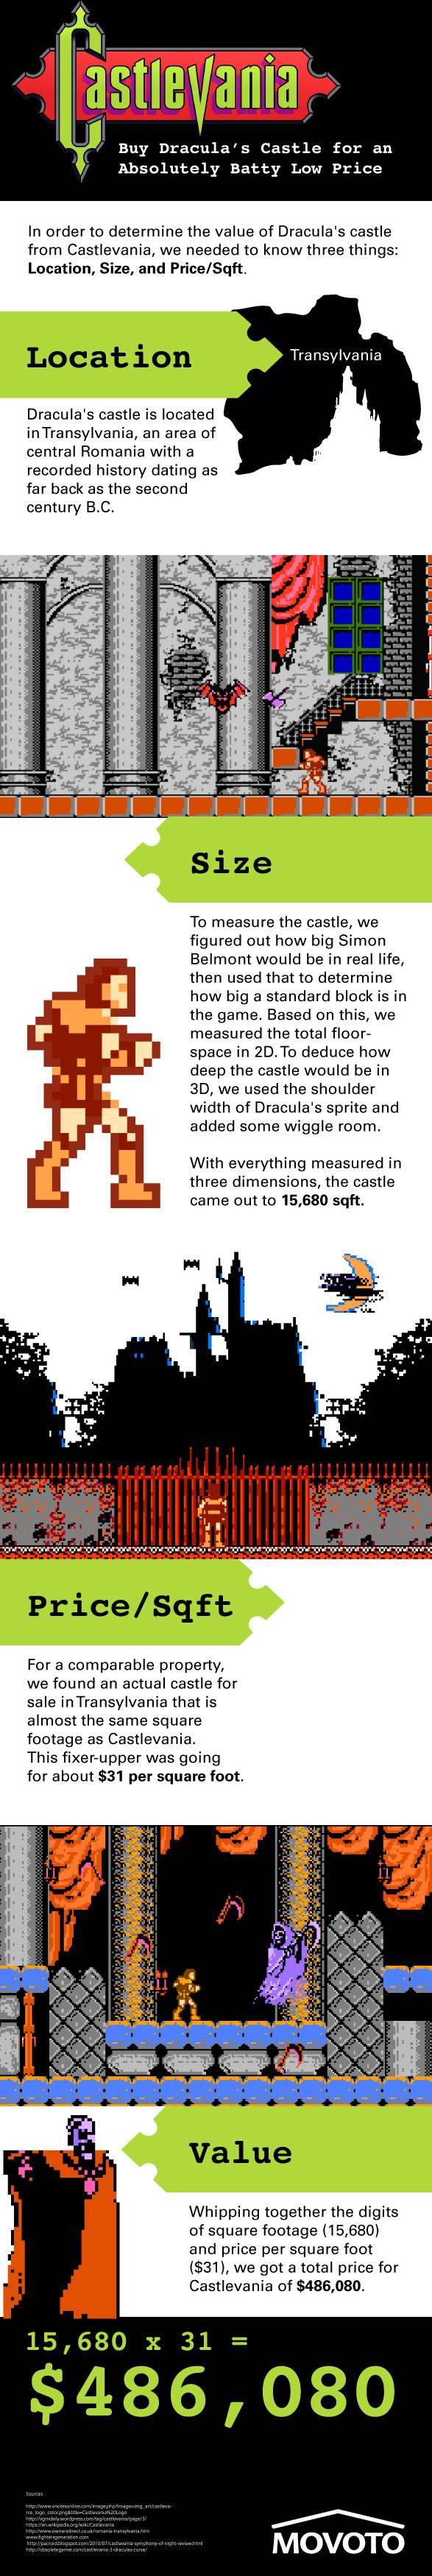 Castlevania For Sale